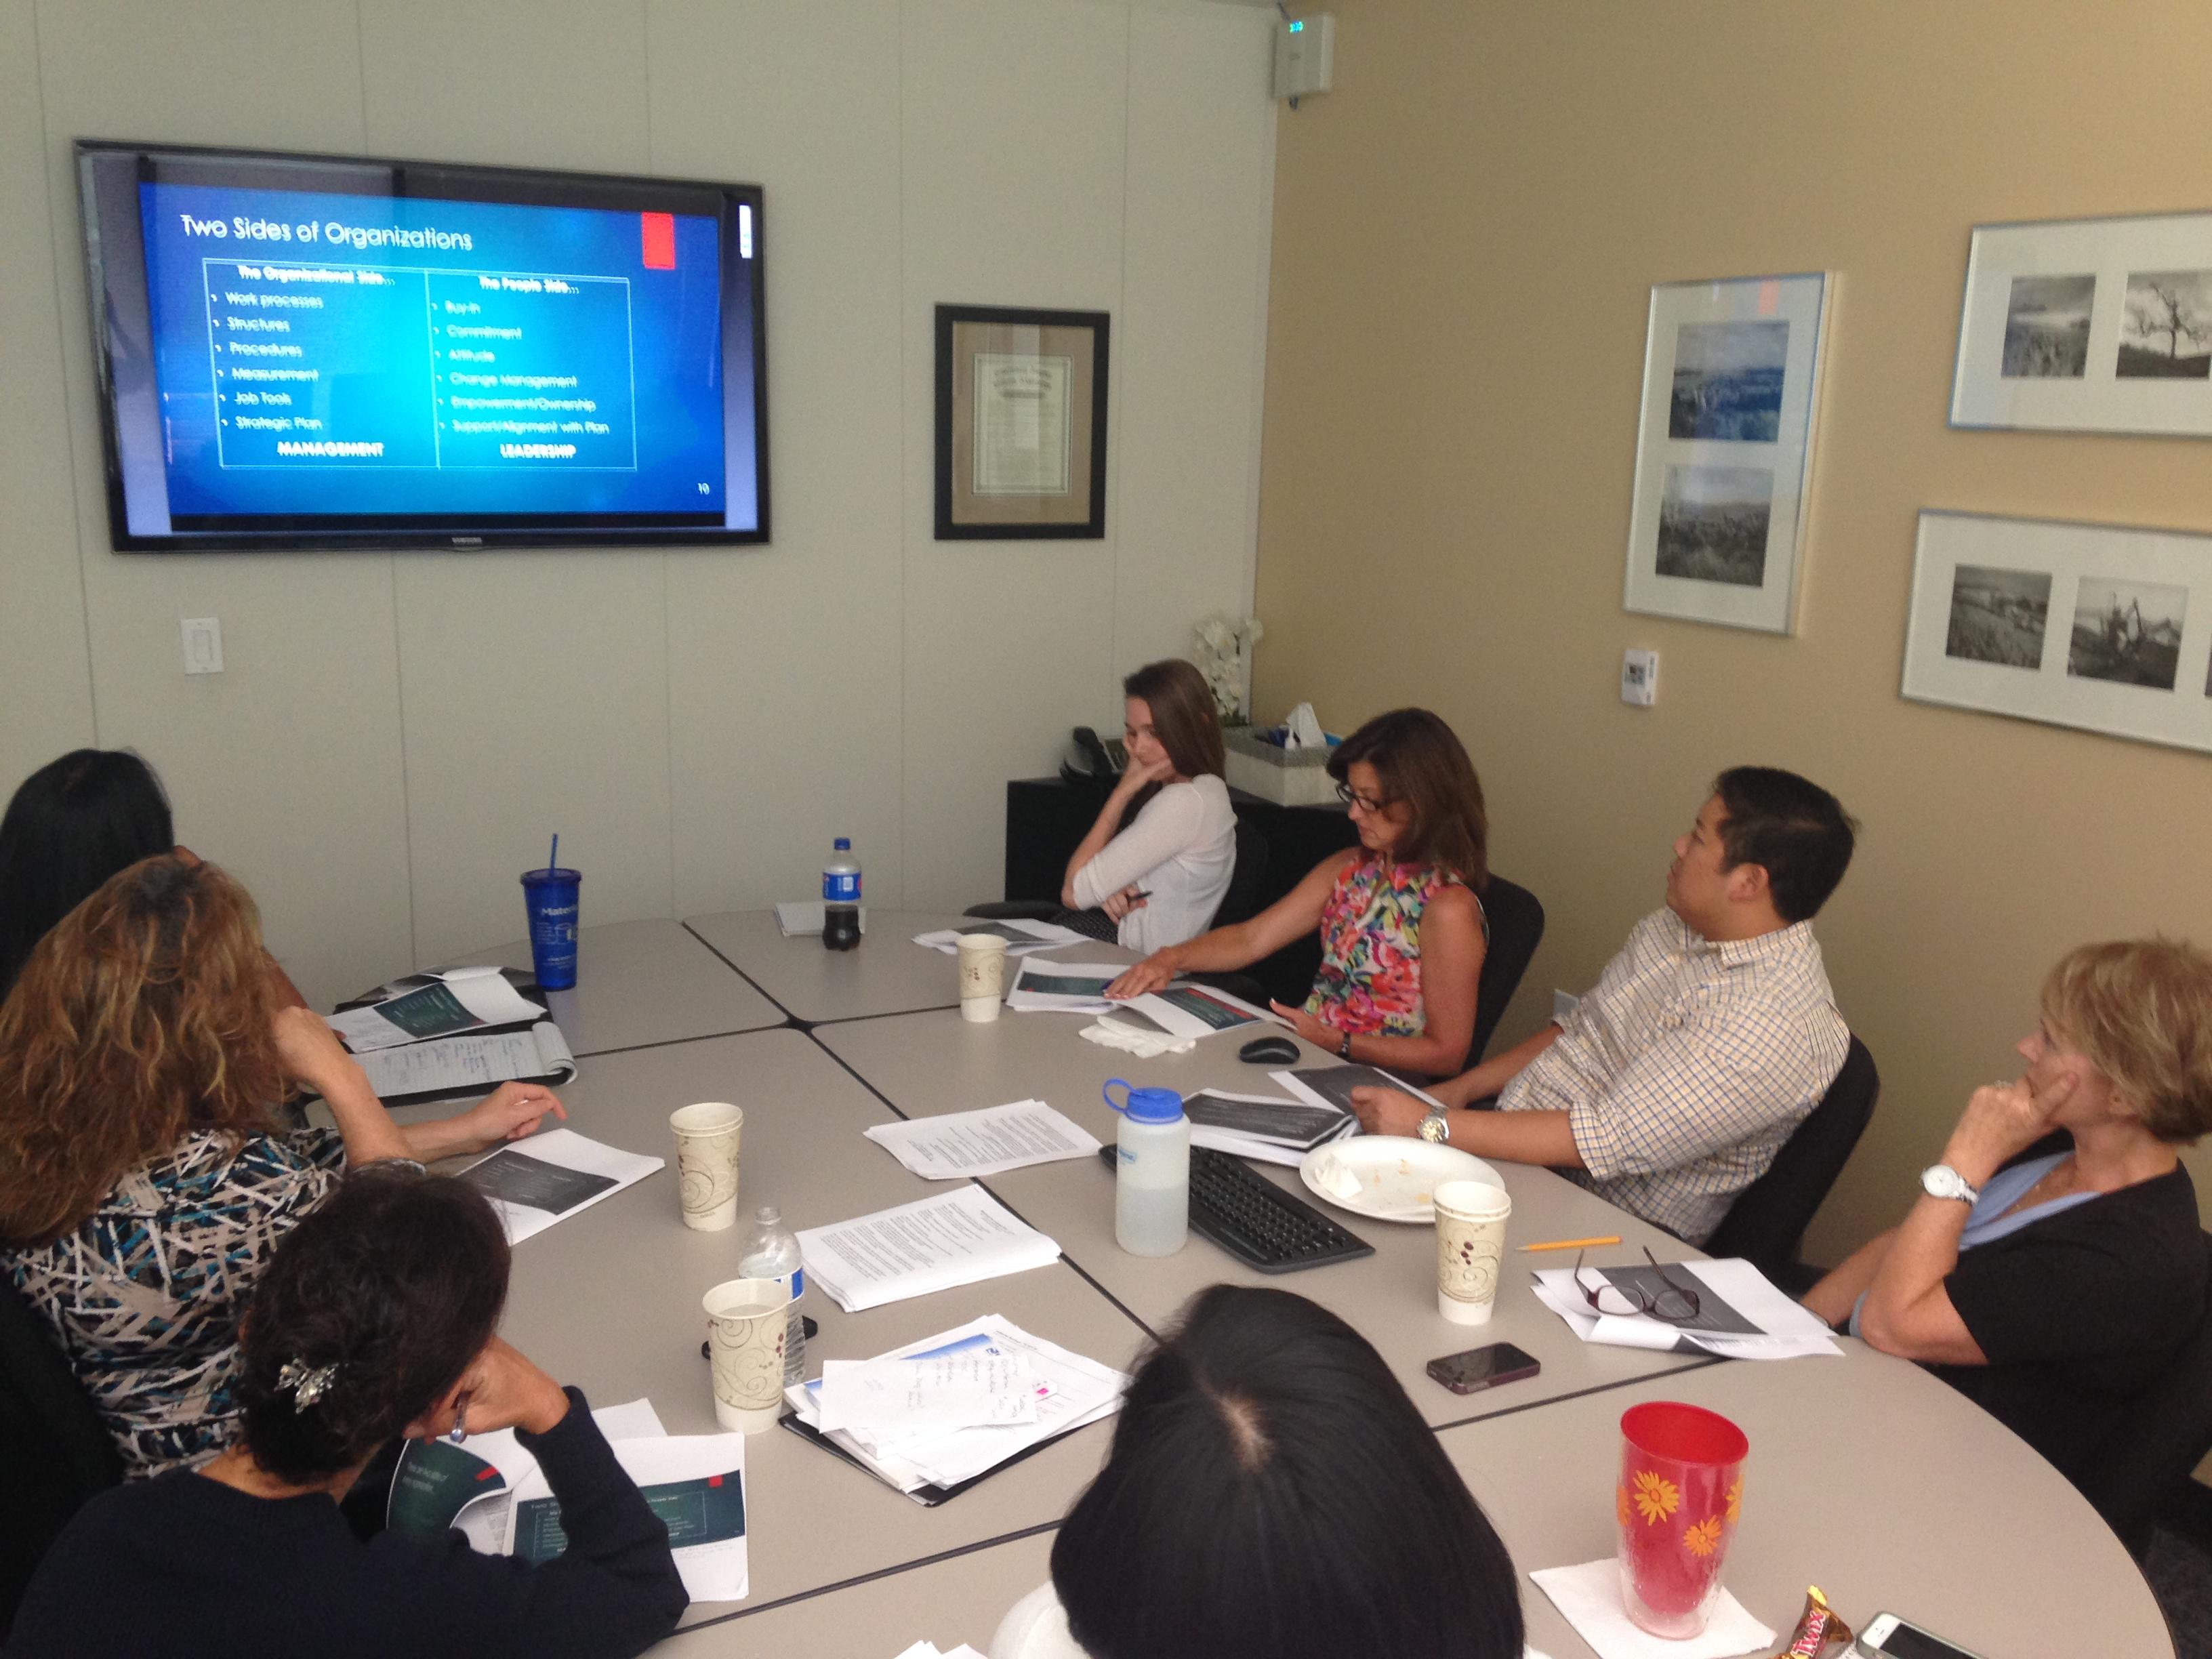 Group learning from webinars